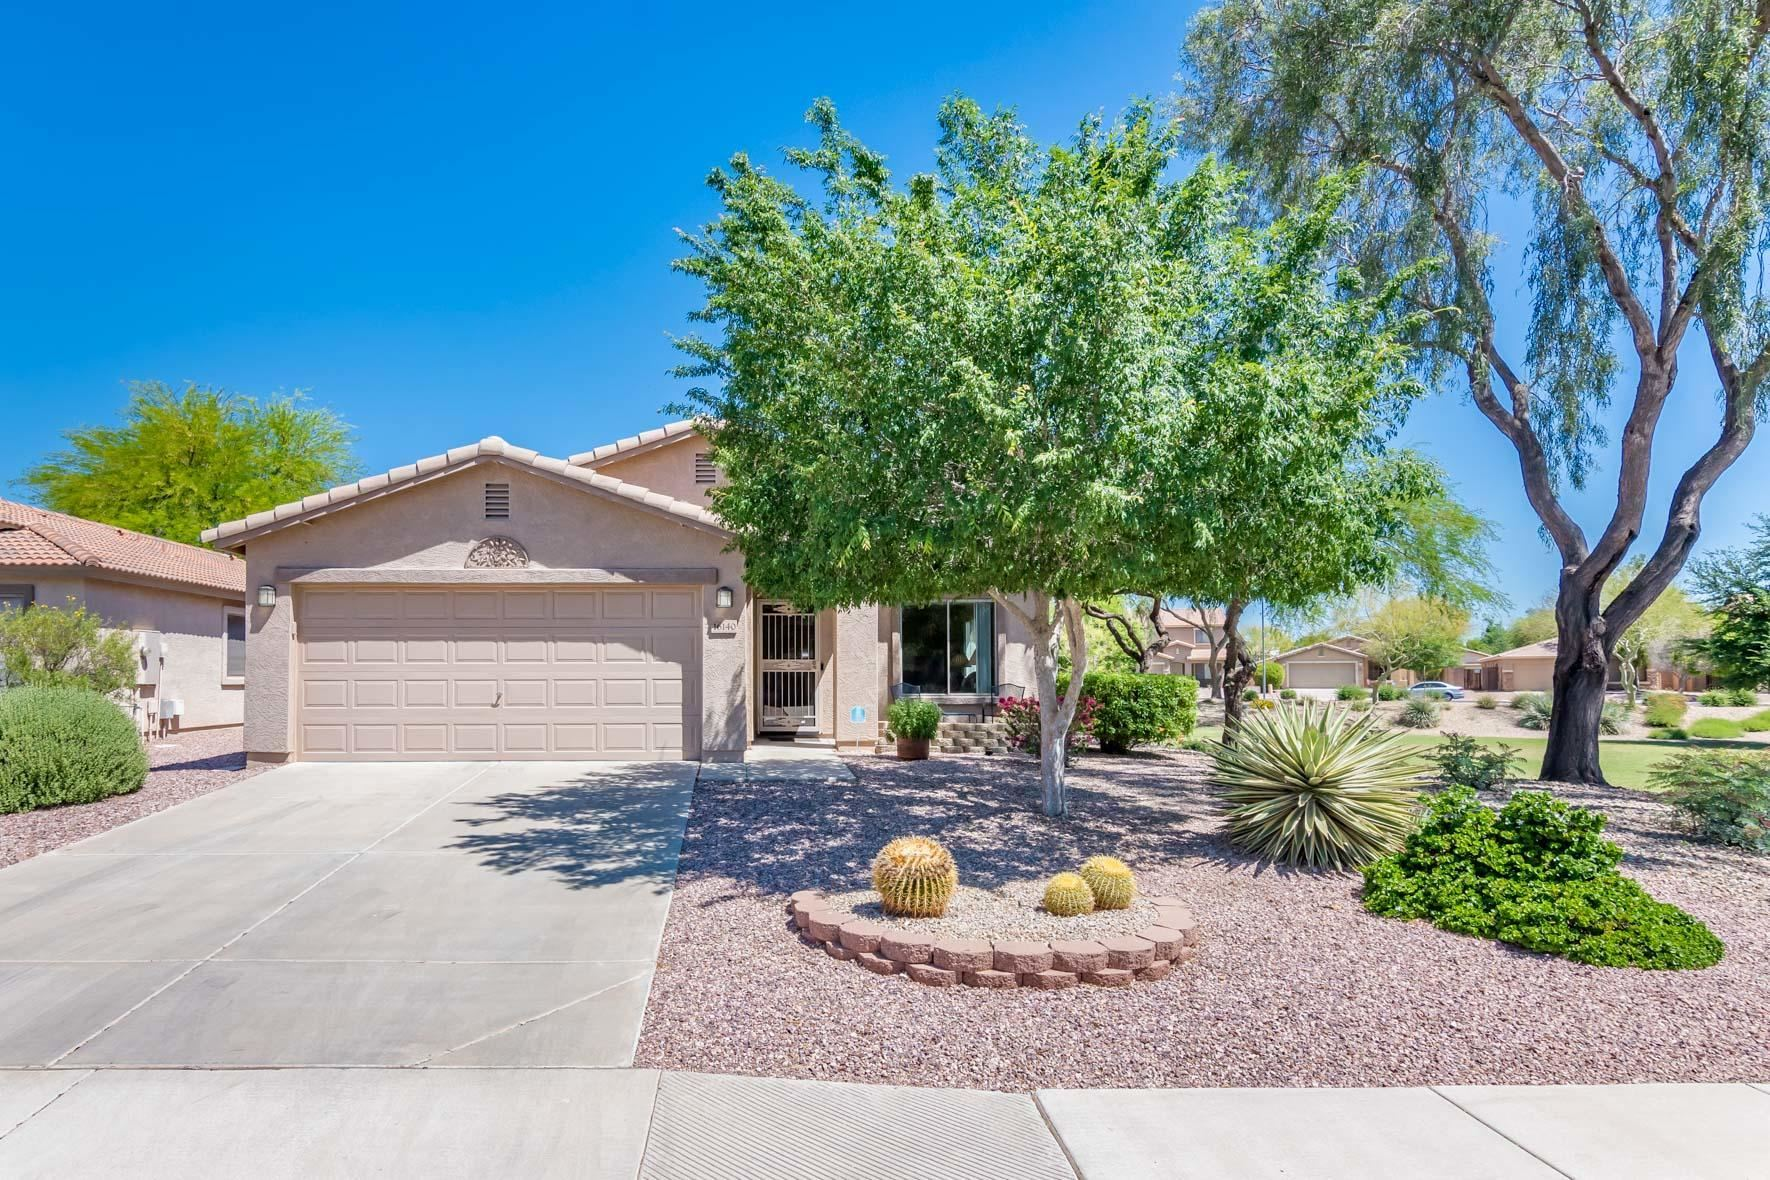 Photo of 16140 W BOCA RATON Road, Surprise, AZ 85379 (MLS # 6231552)